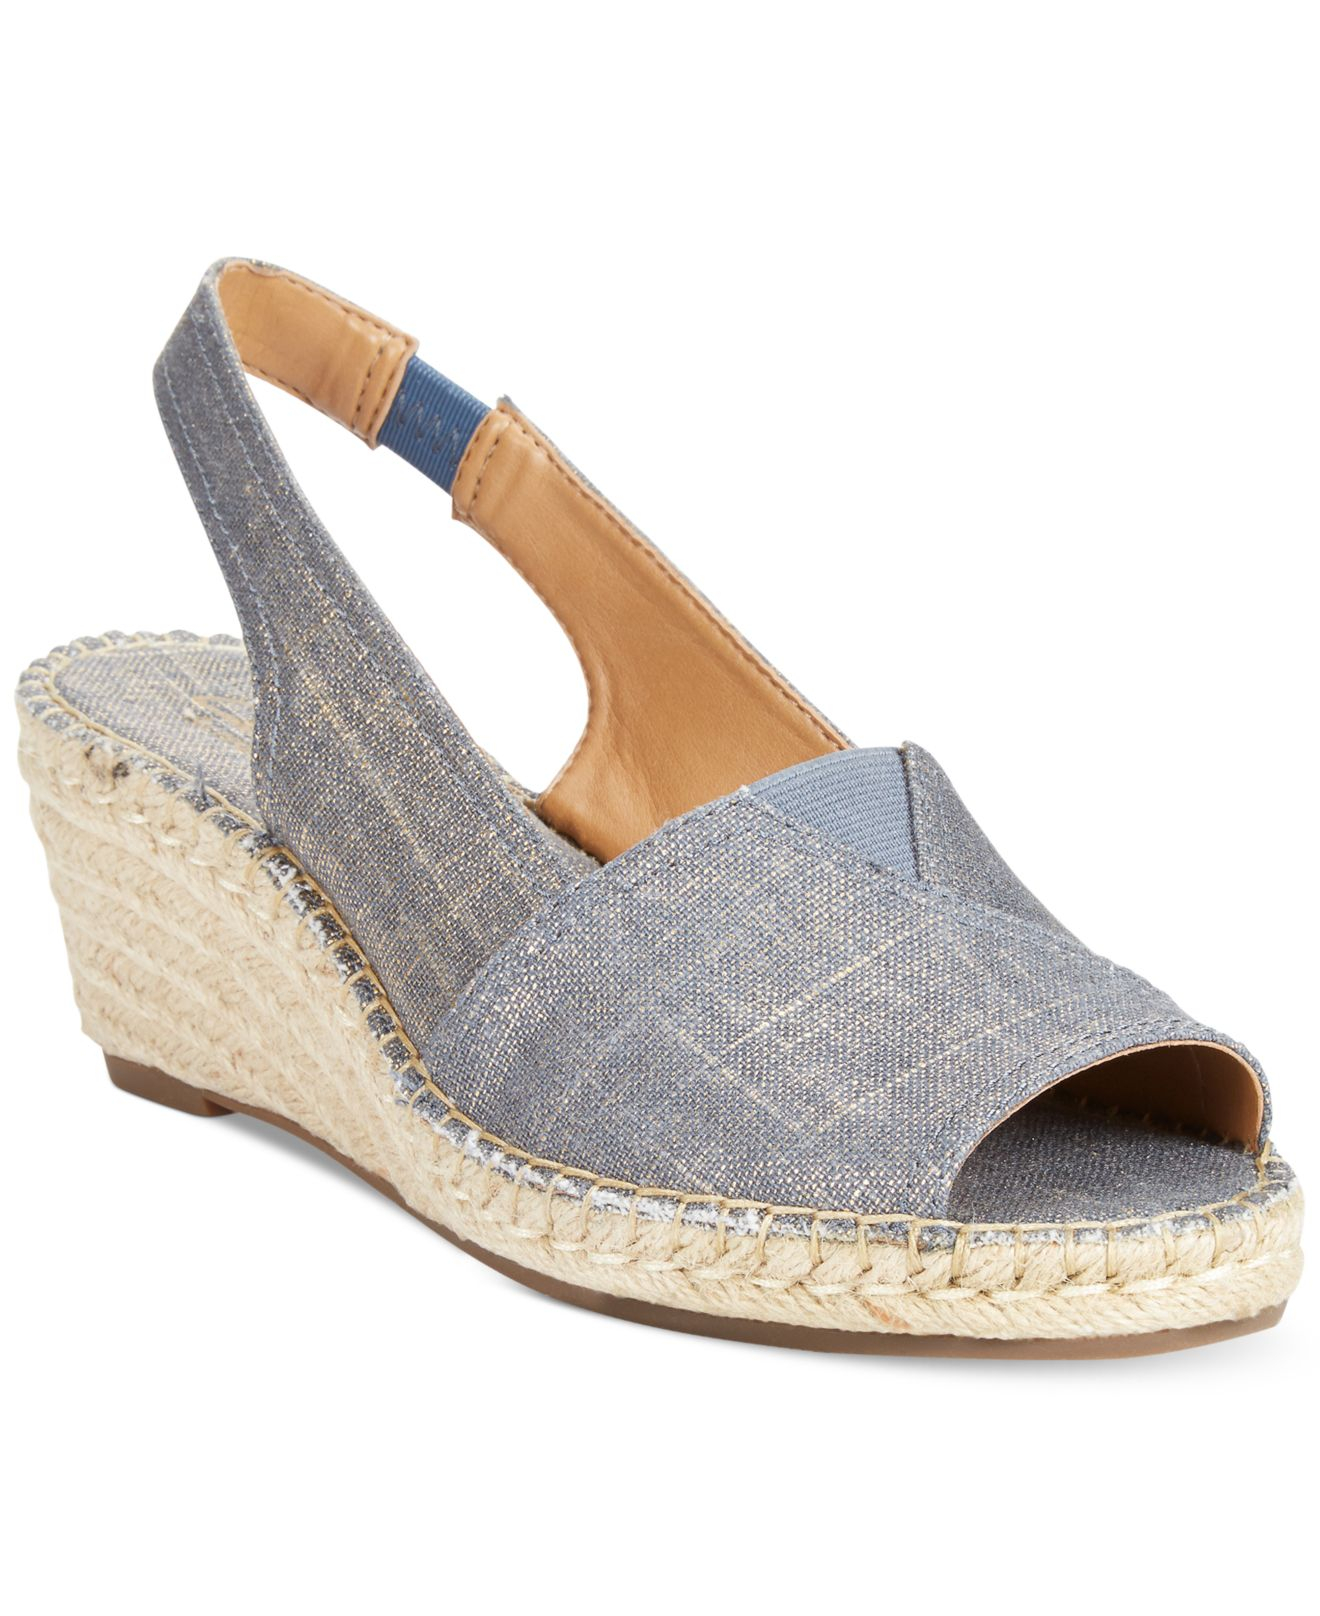 Lyst - Clarks Artisan Women S Petrina Rhea Espadrille Wedge Sandals ...